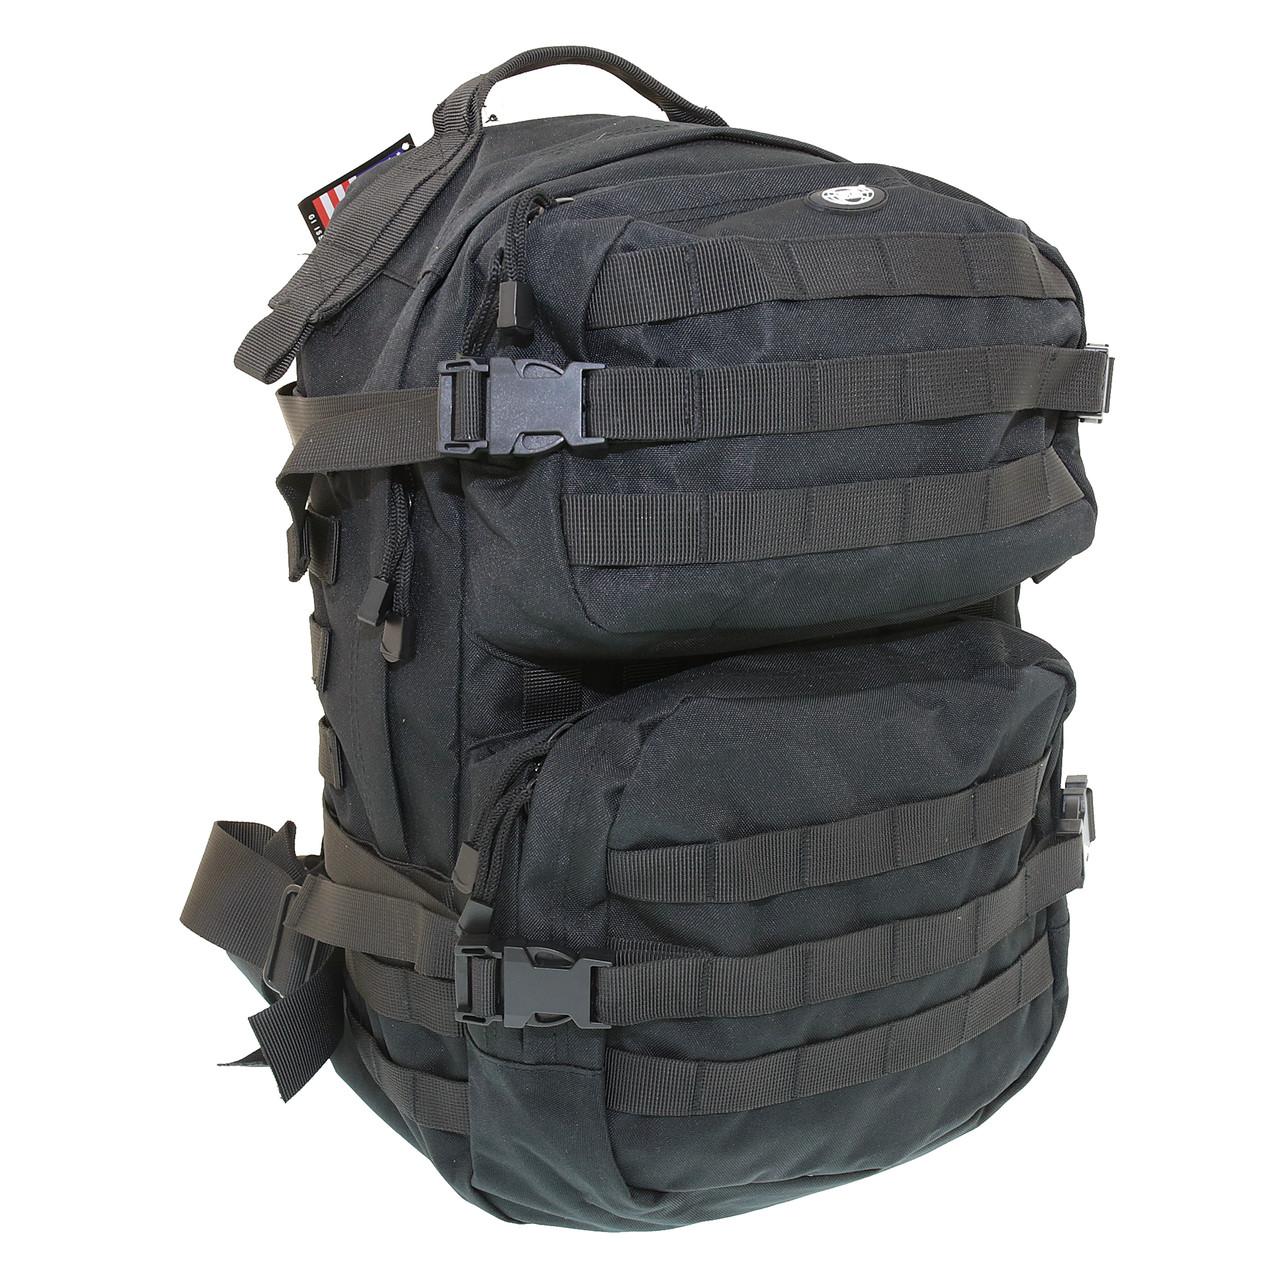 Рюкзак чорний тактичний 40 літрів Max Fuchs Assault II Black, 30343A